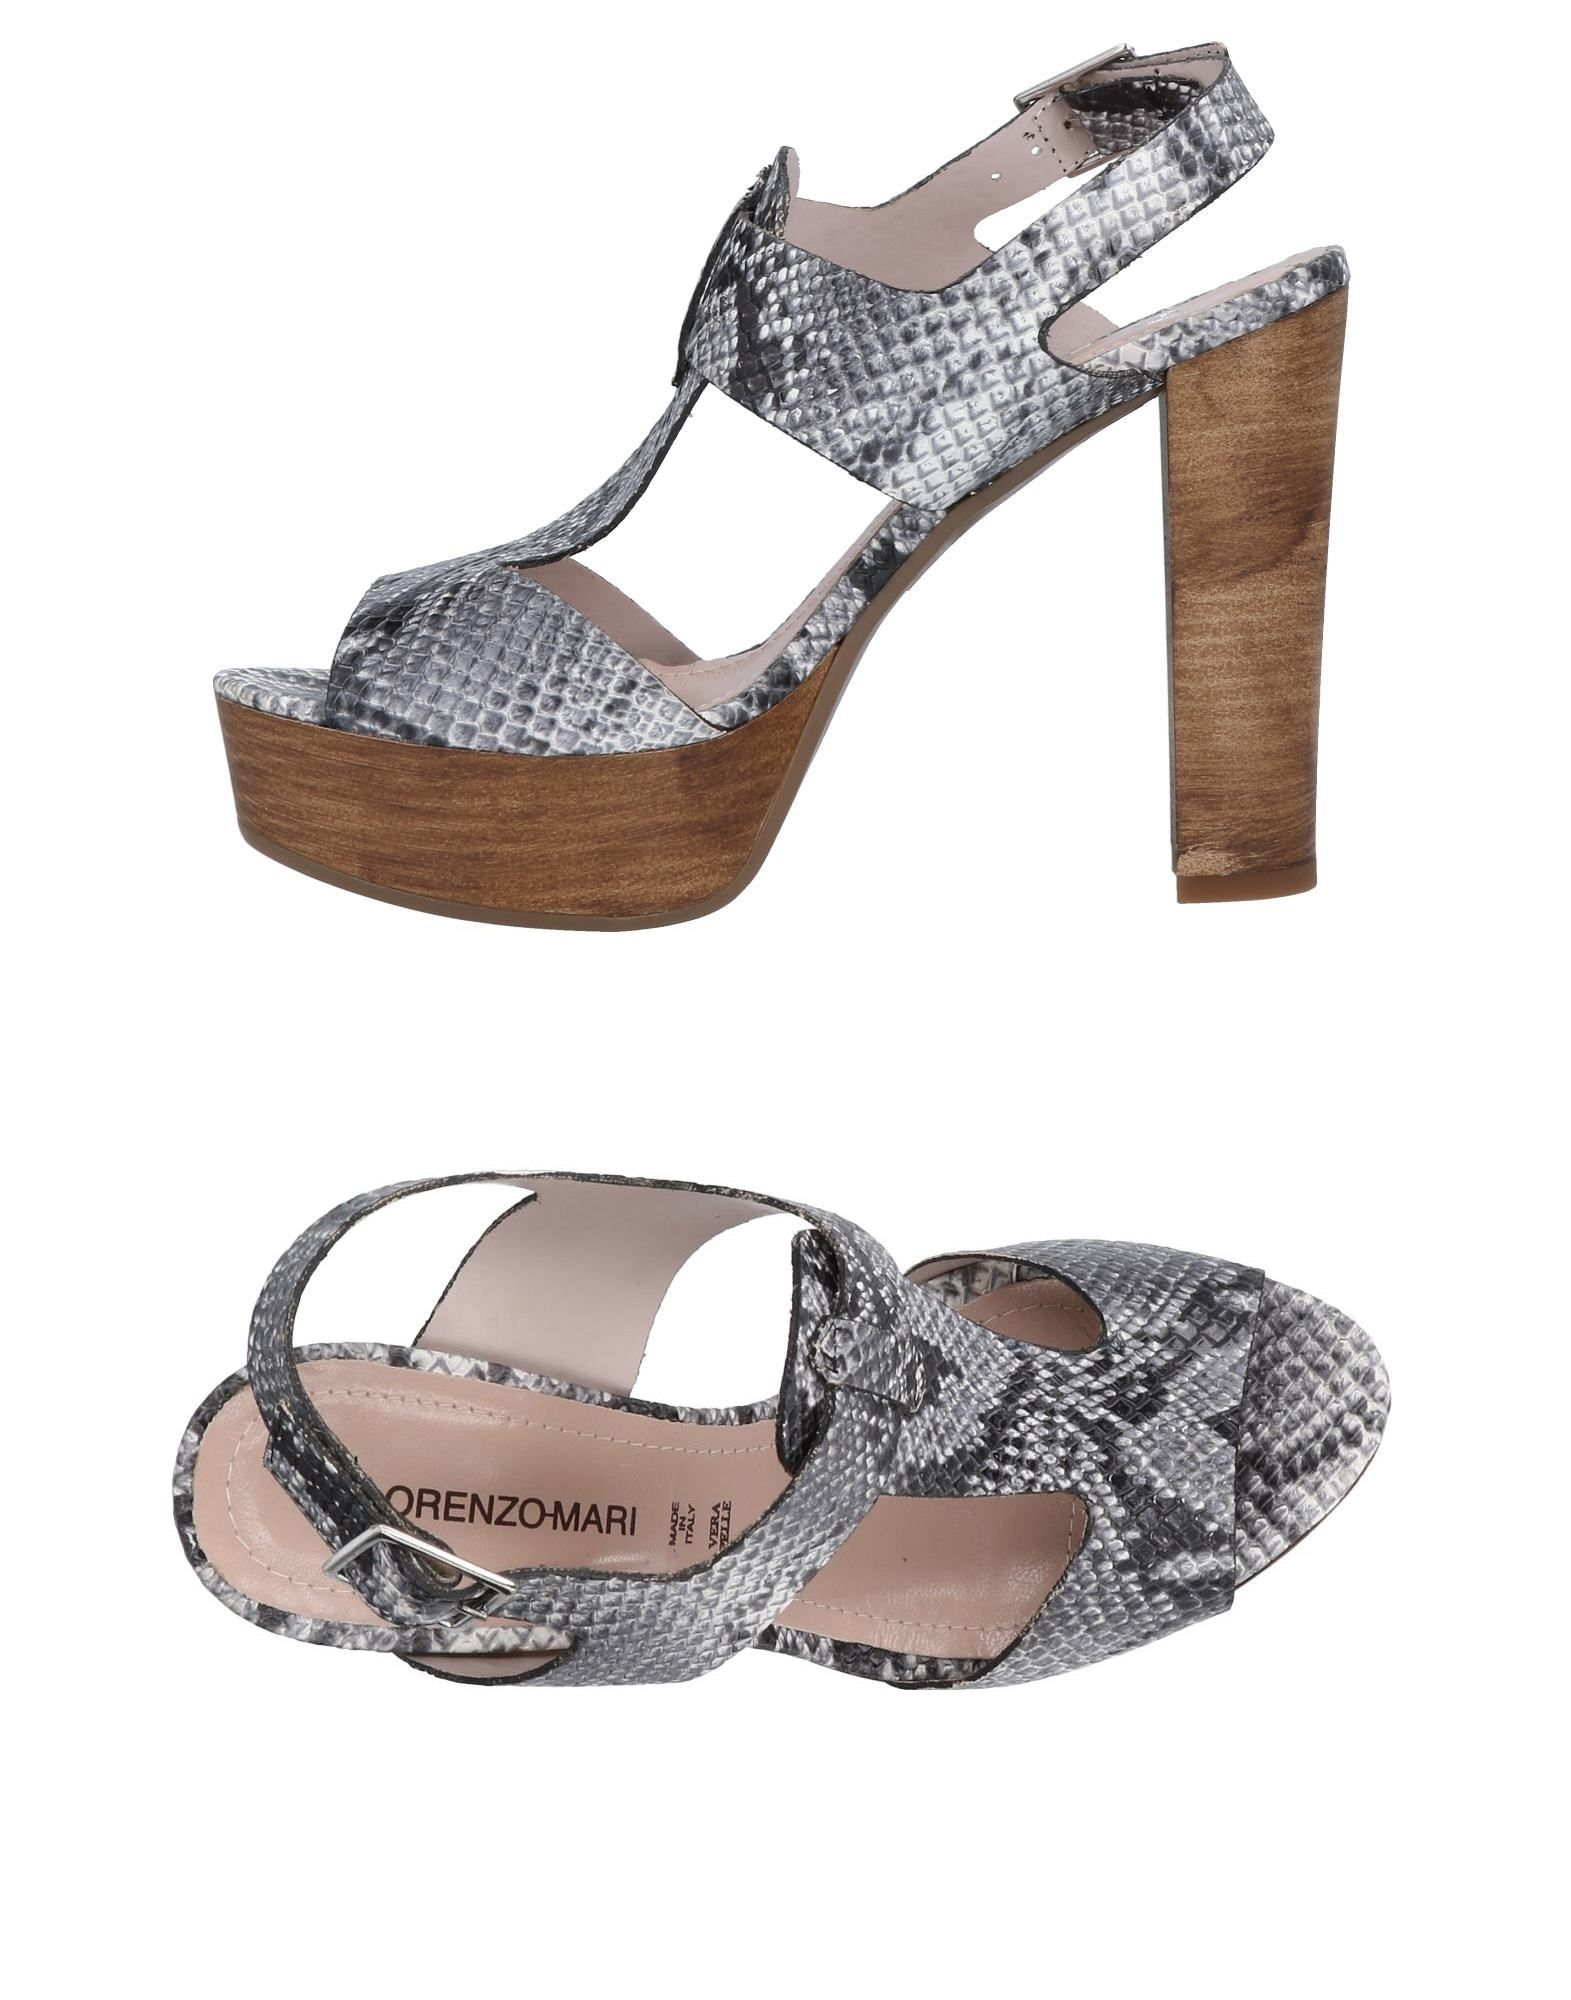 Lorenzo Mari Sandalen Damen  11480861BB Gute Qualität beliebte Schuhe